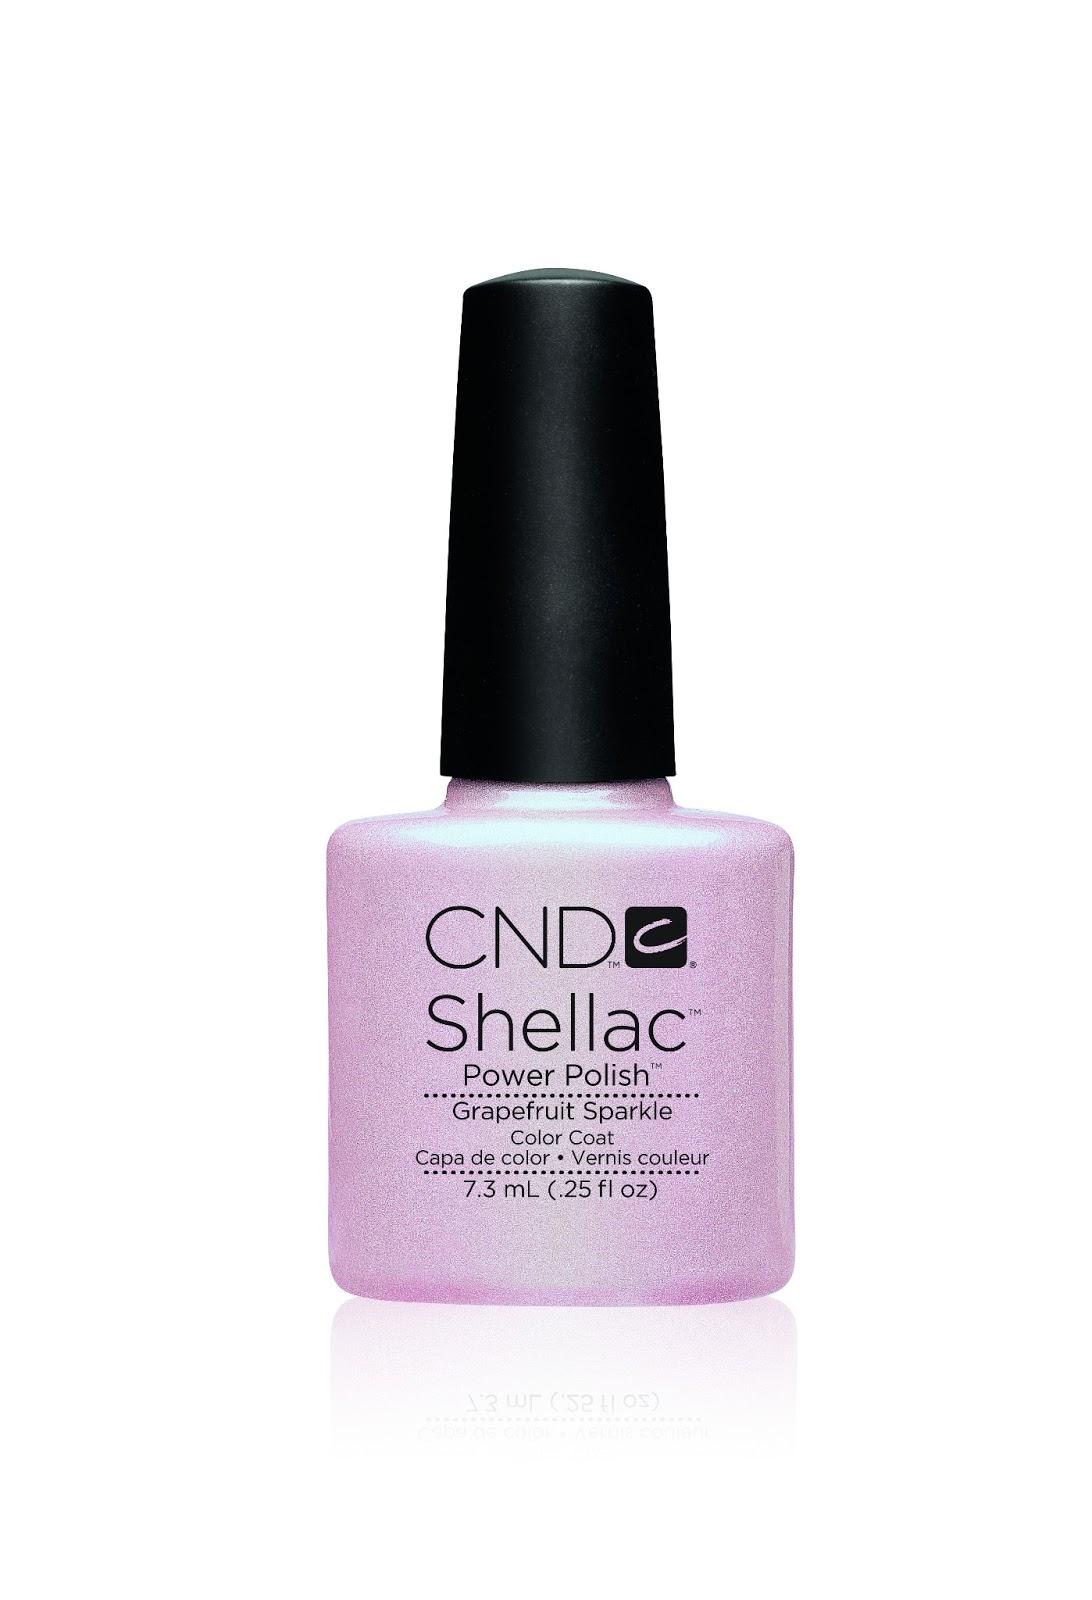 Cnd Creative Play Nail Lacquer Reviews In Nail Polish: CND Shellac Sweet Dreams Collection 2013